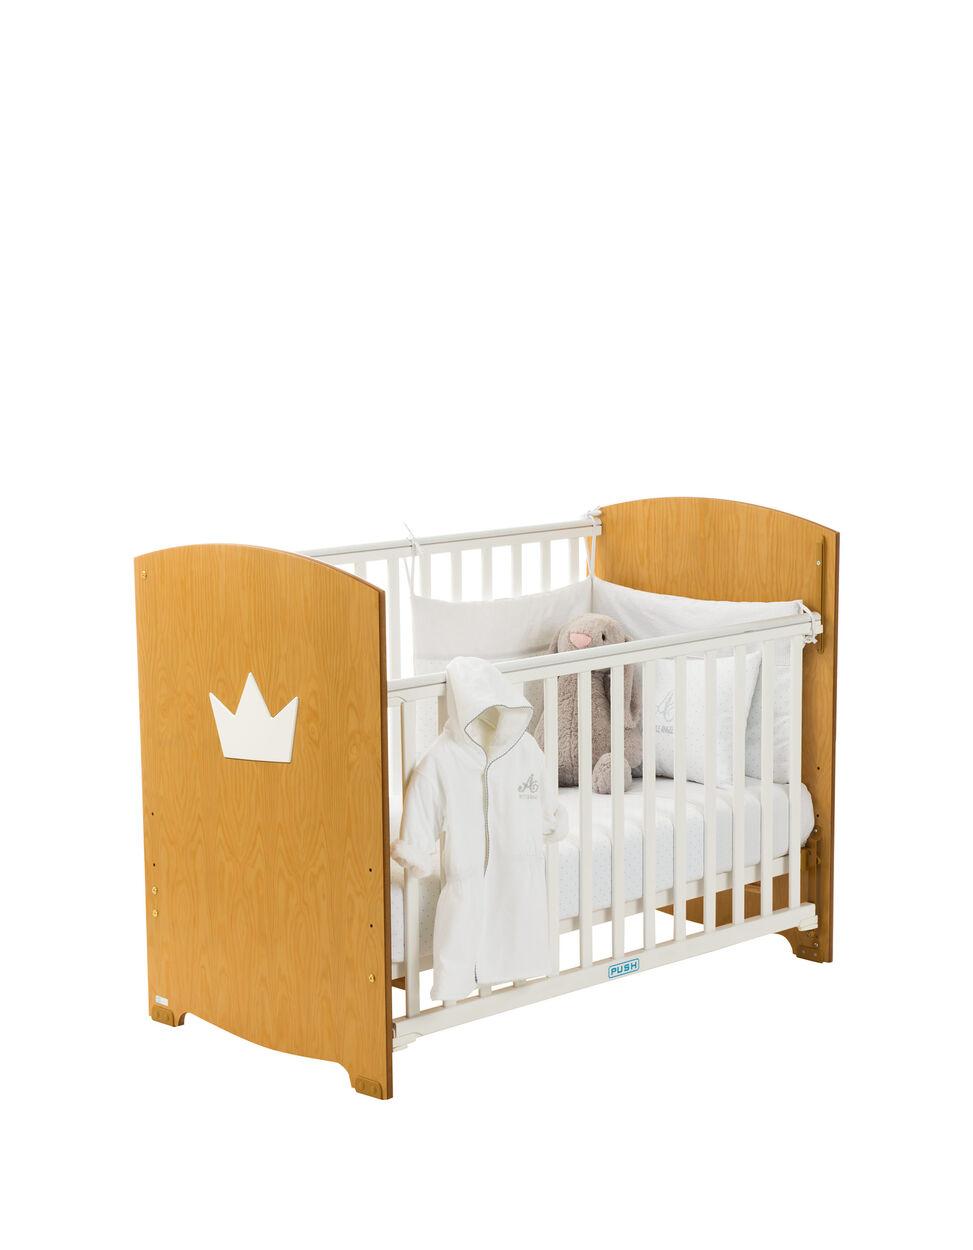 Cuna Crown 120x60 cm Zy Baby